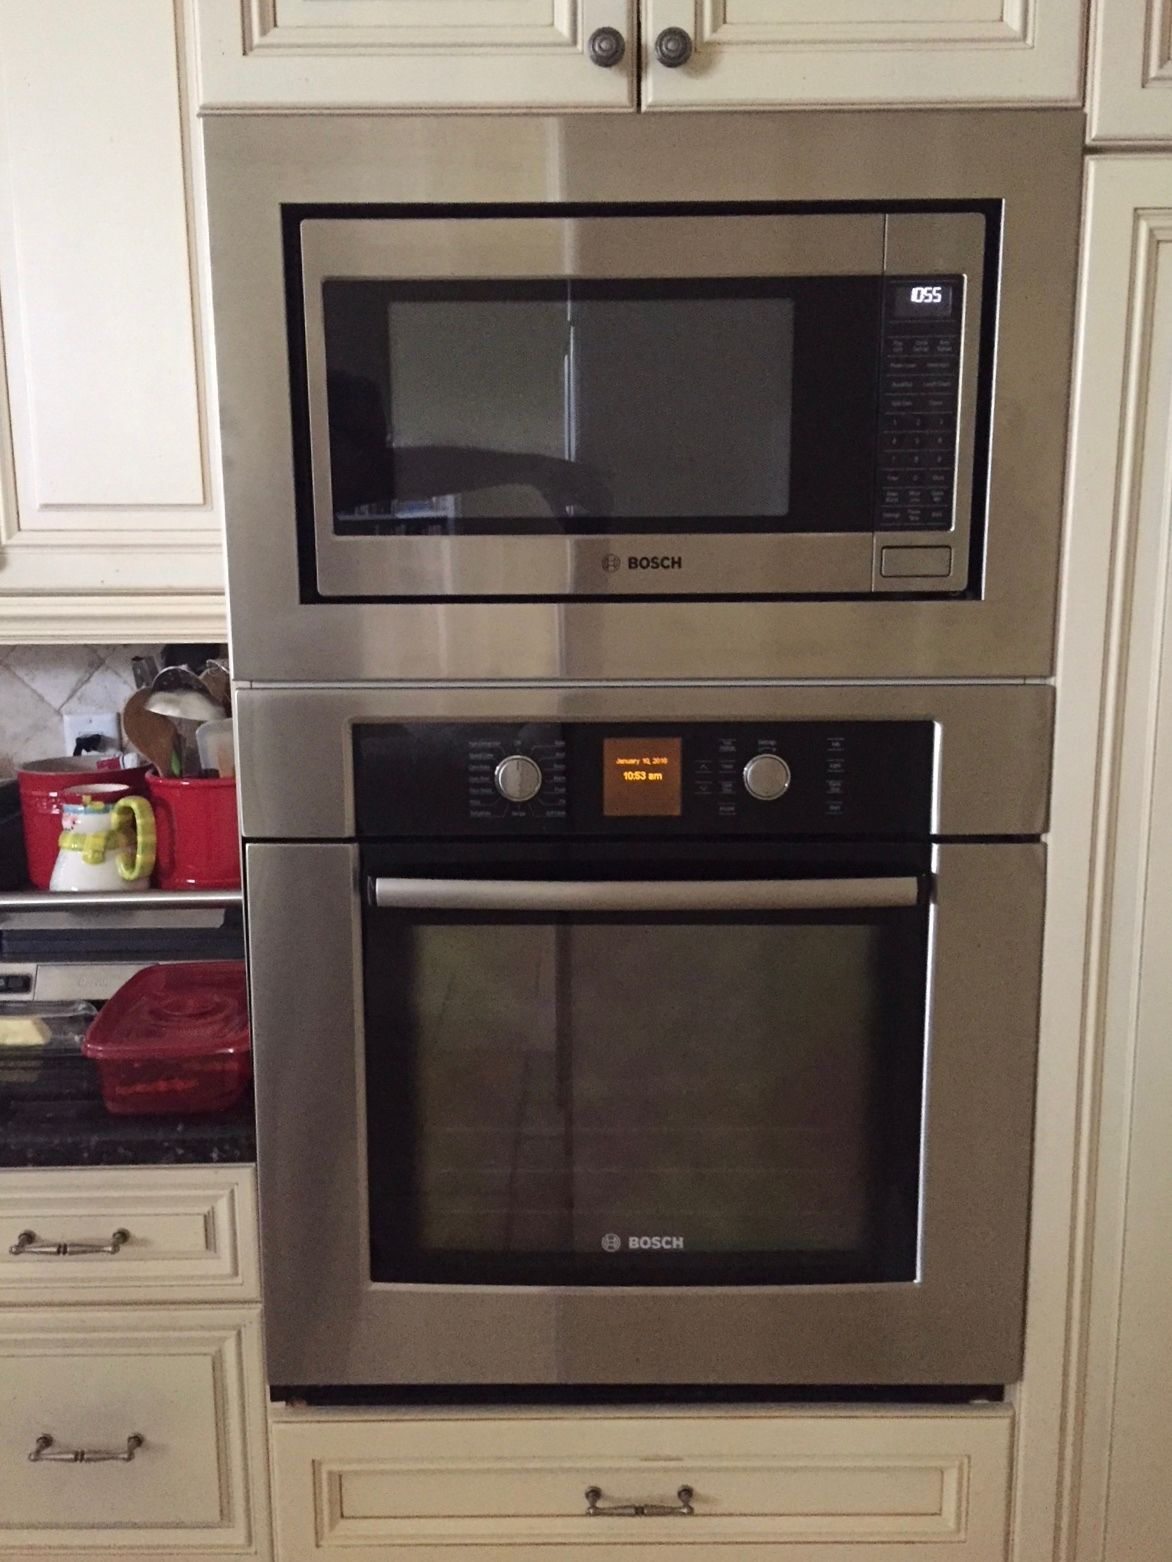 bosch microwave model hmb5051 custom